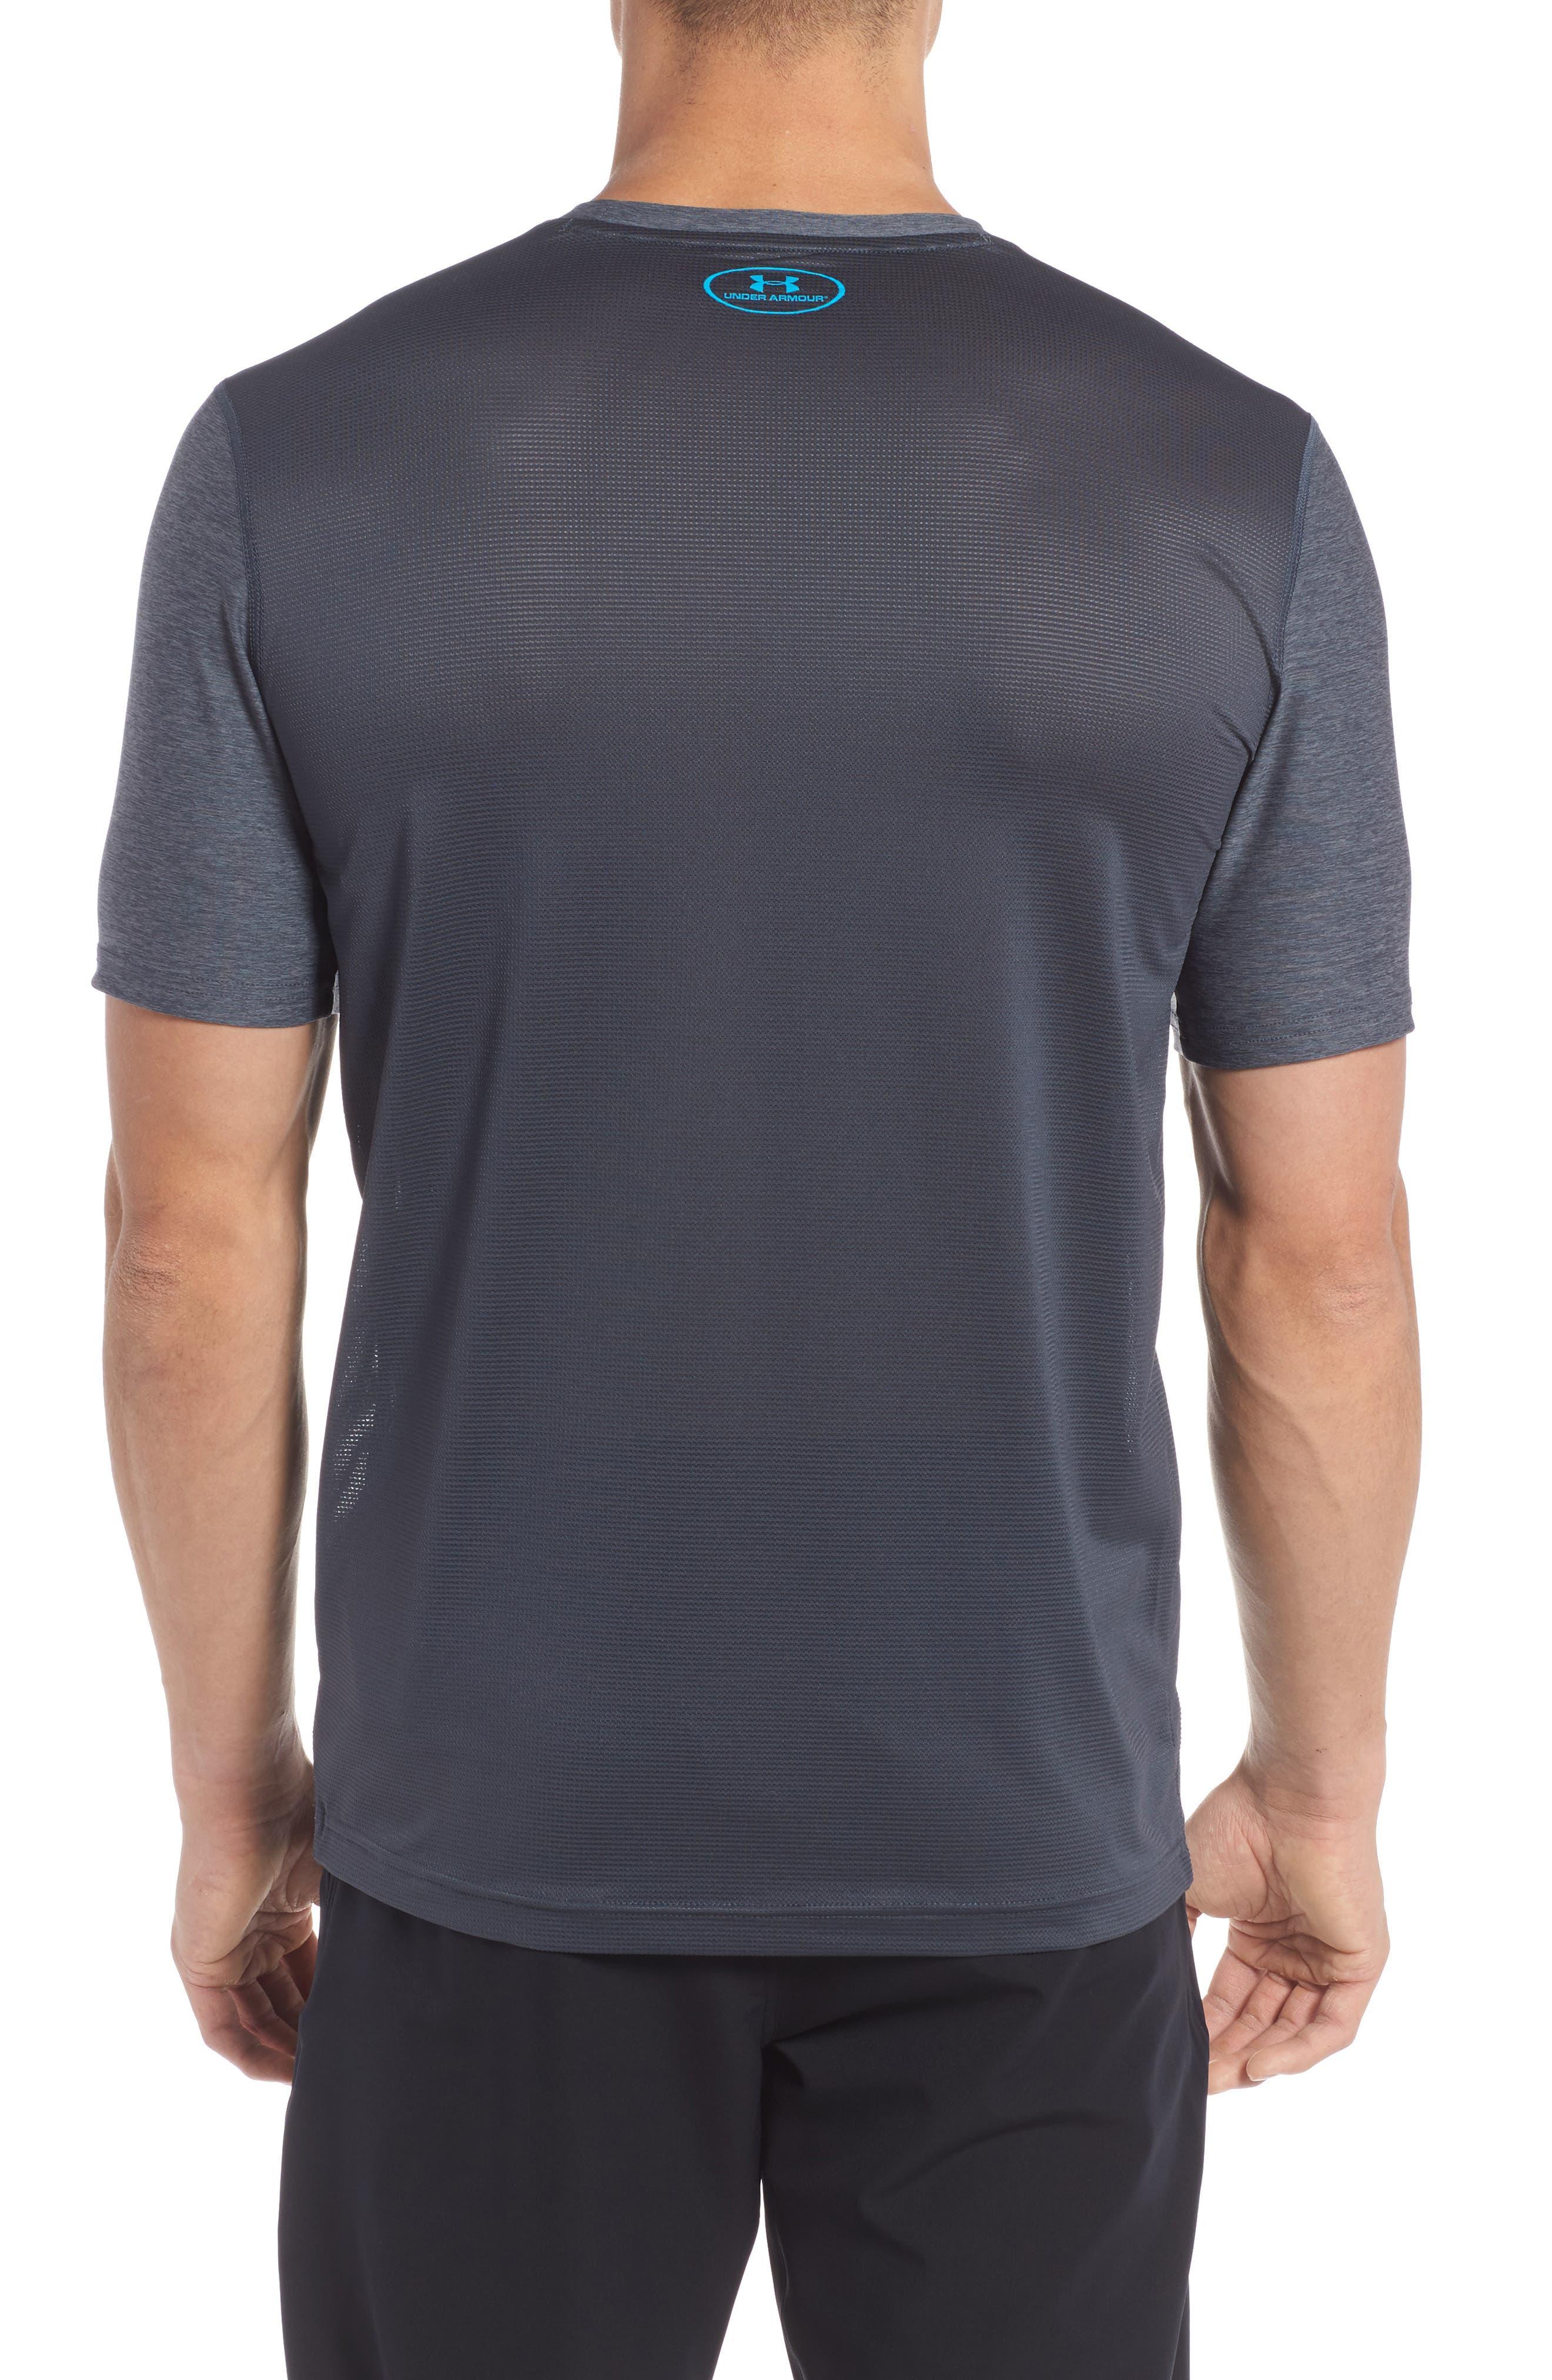 Alternate Image 2  - Under Armour Raid Graphic T-Shirt